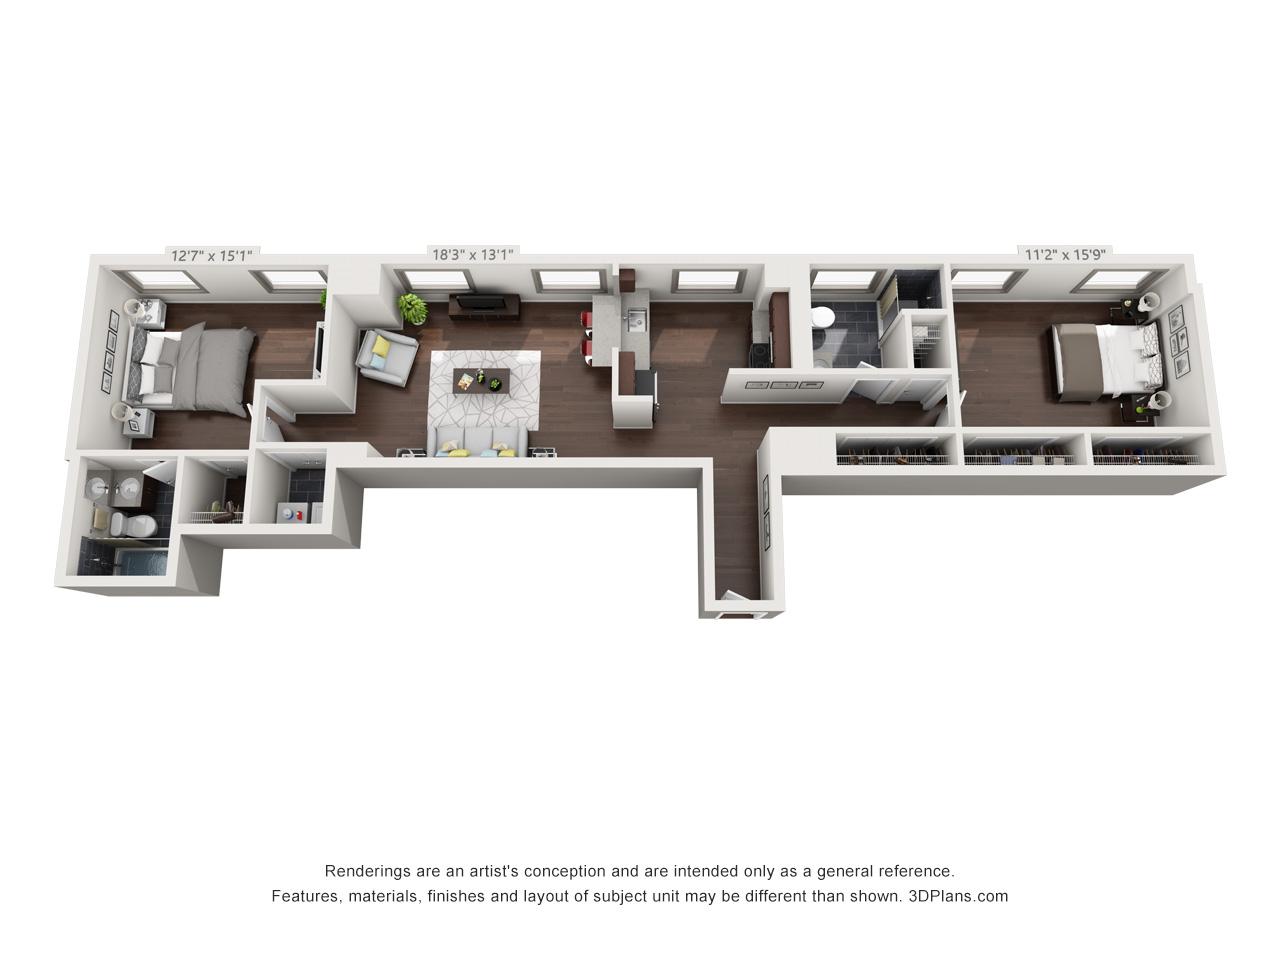 2 bedroom apartments in fairmount philadelphia